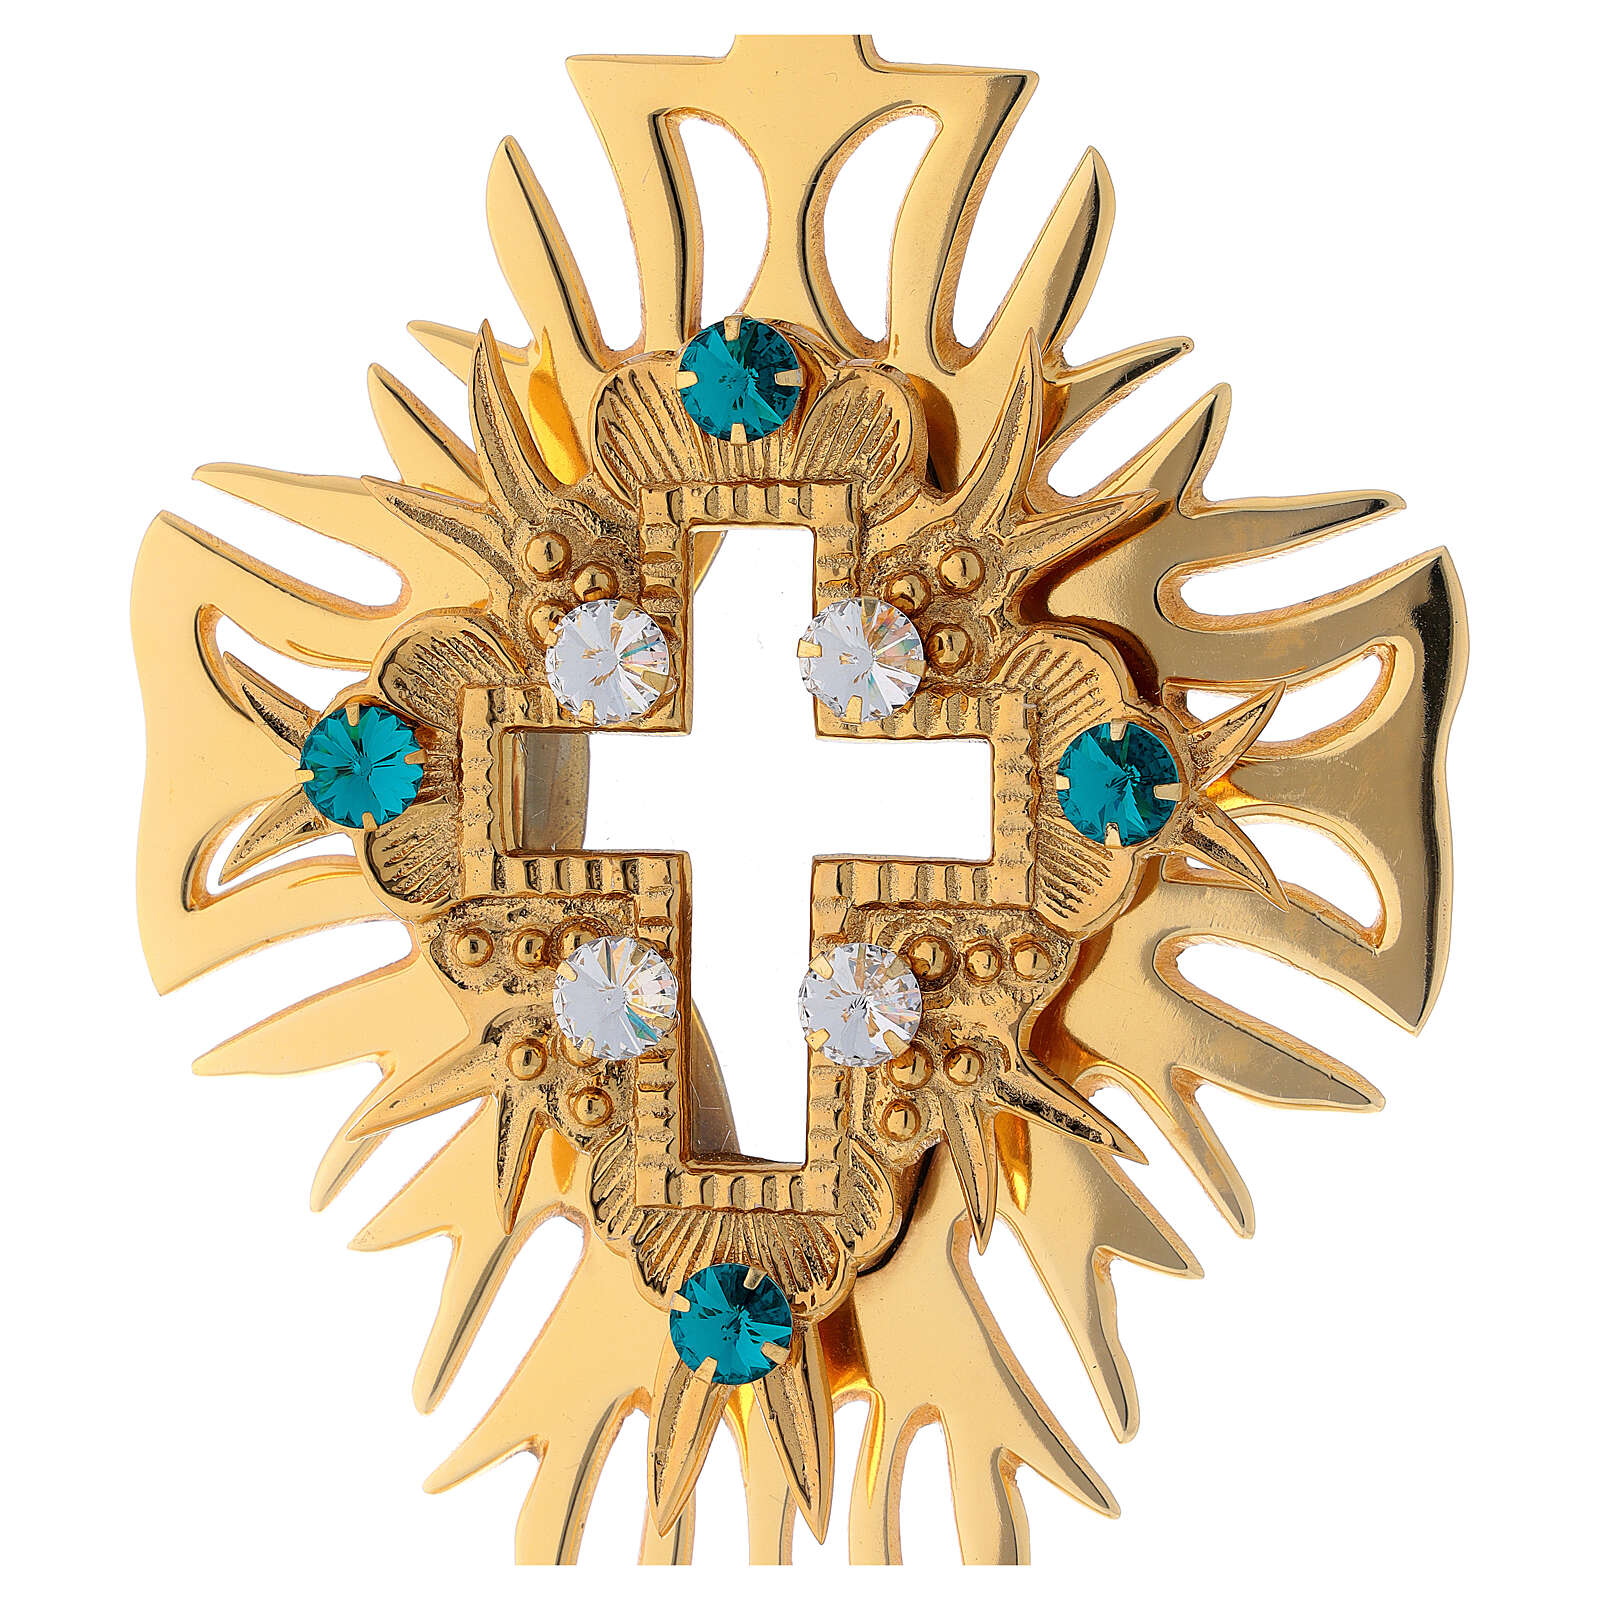 Relicario latón dorado cristales cruz decorada altura 30 cm 4